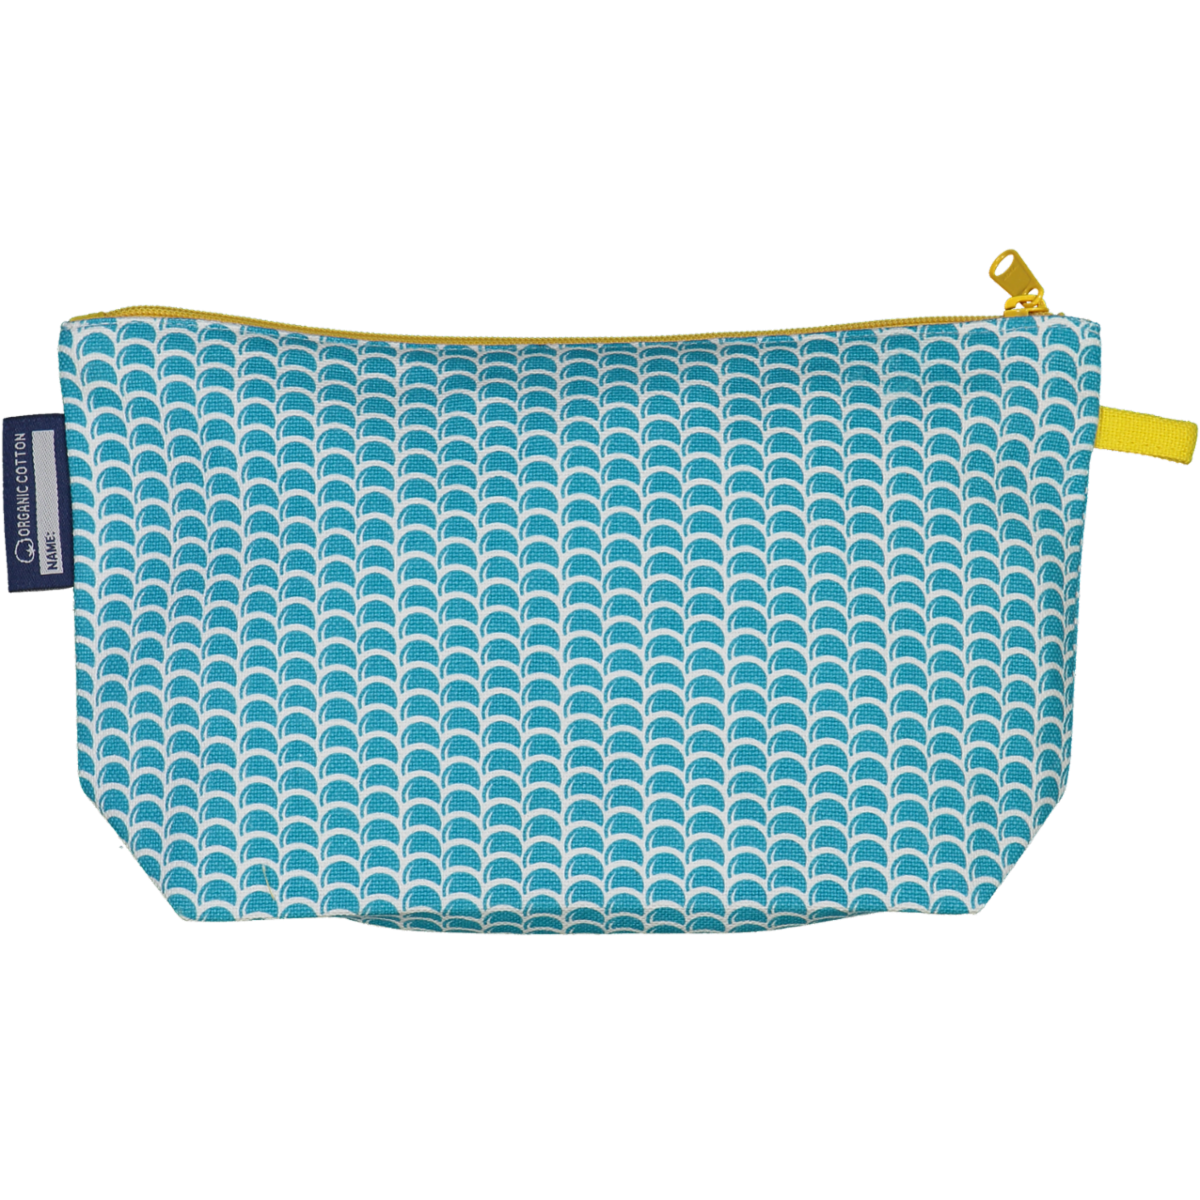 turtle-pencil-case2